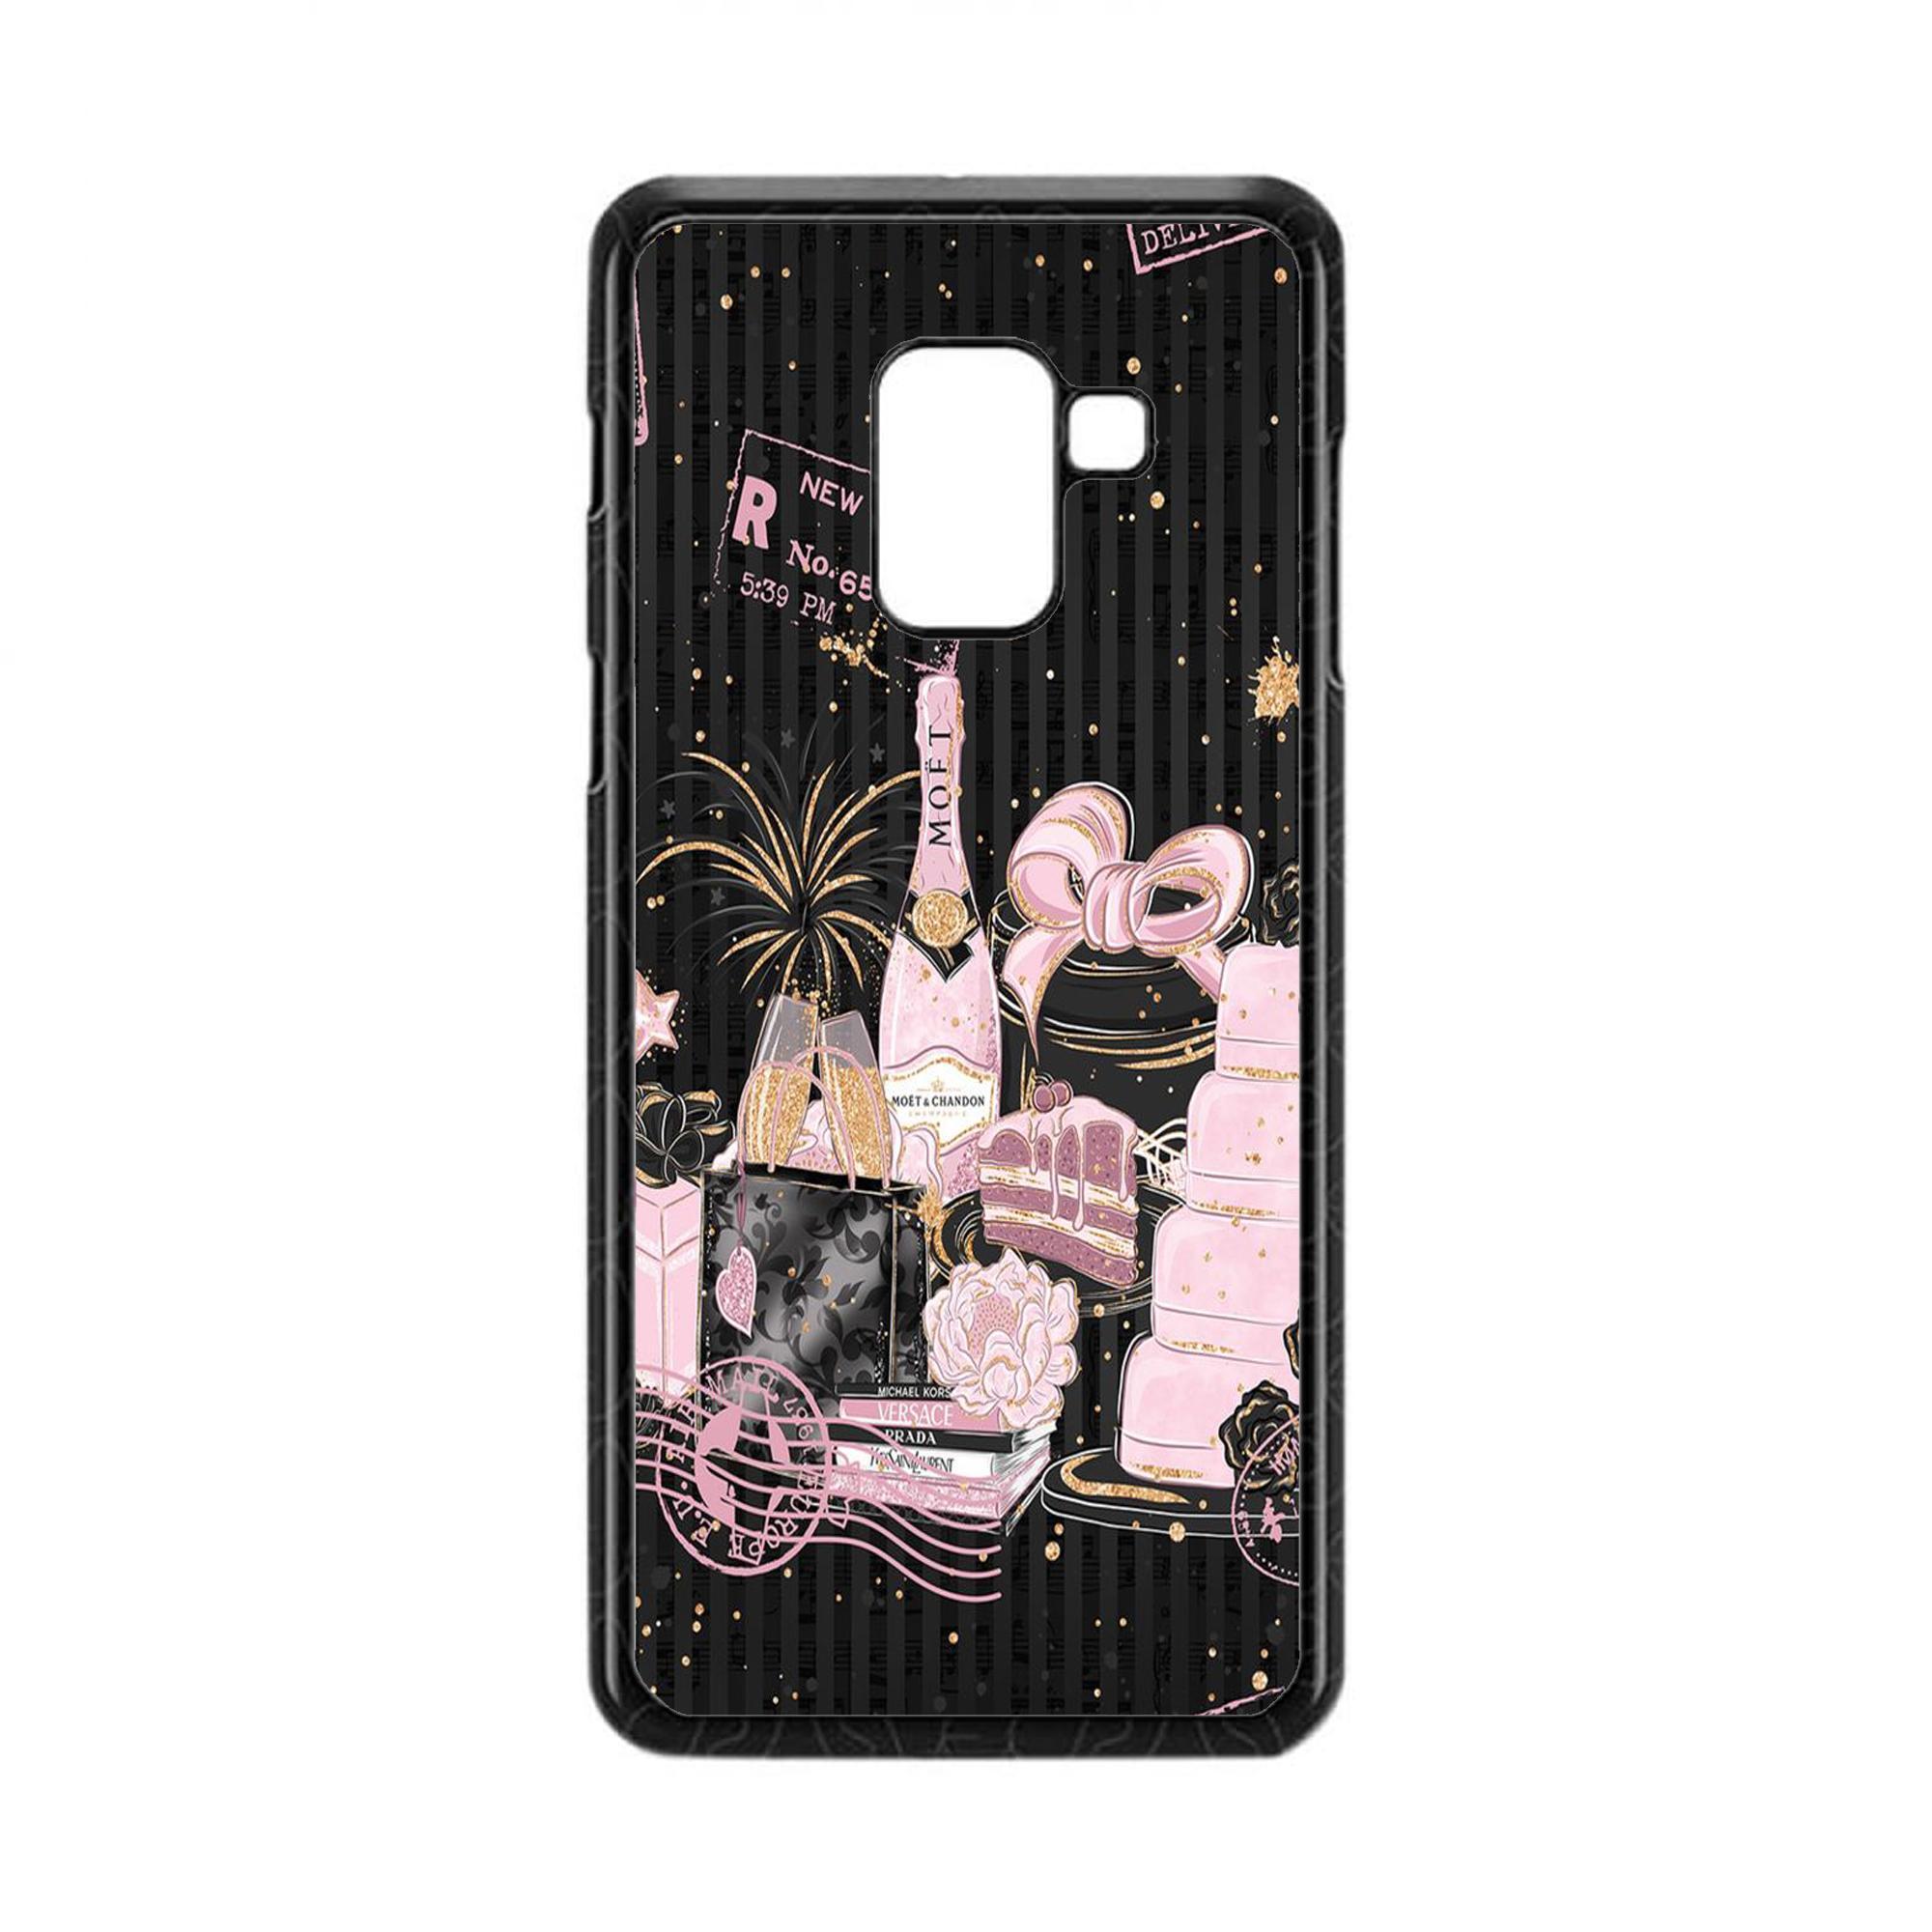 Rajamurah fashion printing case Samsung Galaxy J6 Plus - 10